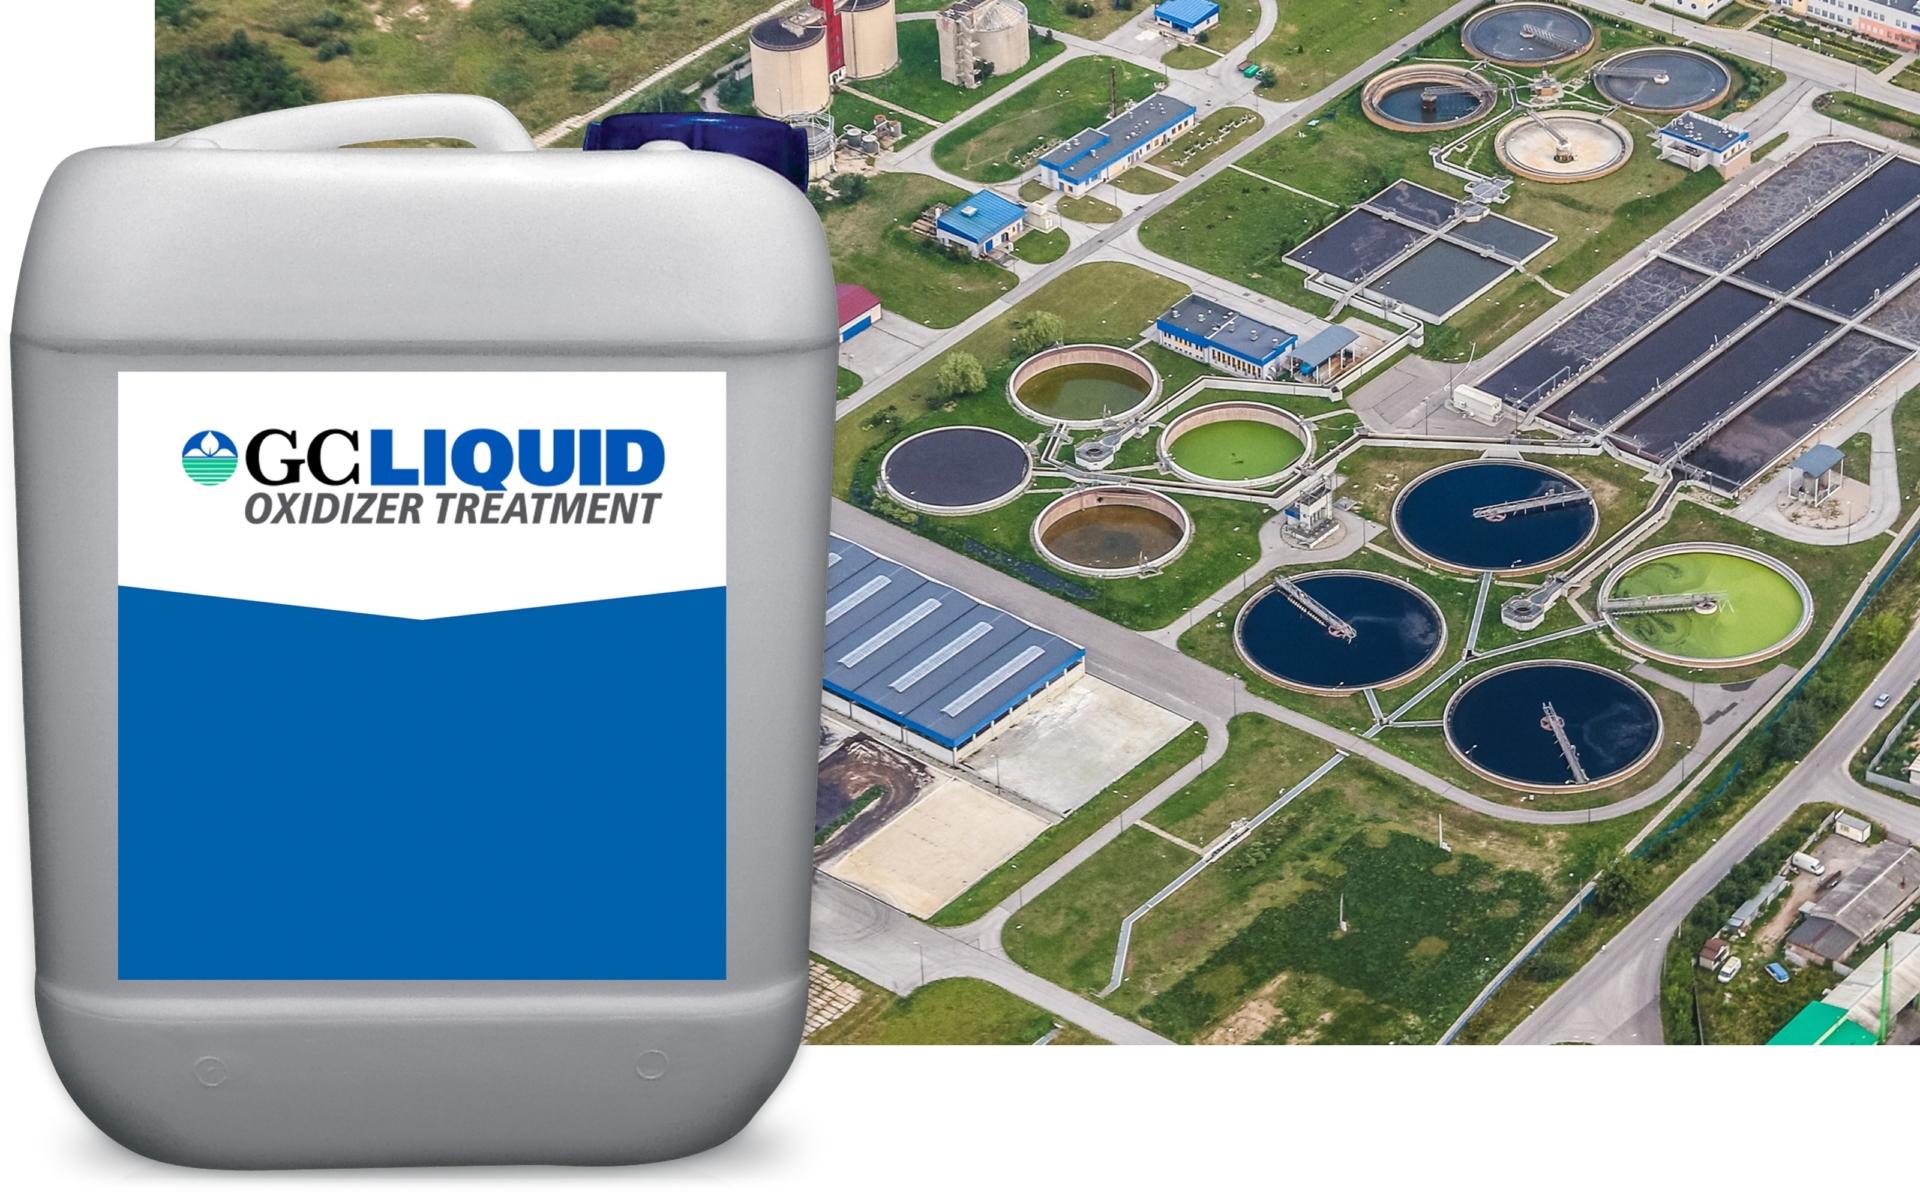 GC Liquid Oxidizer Treatment product shot